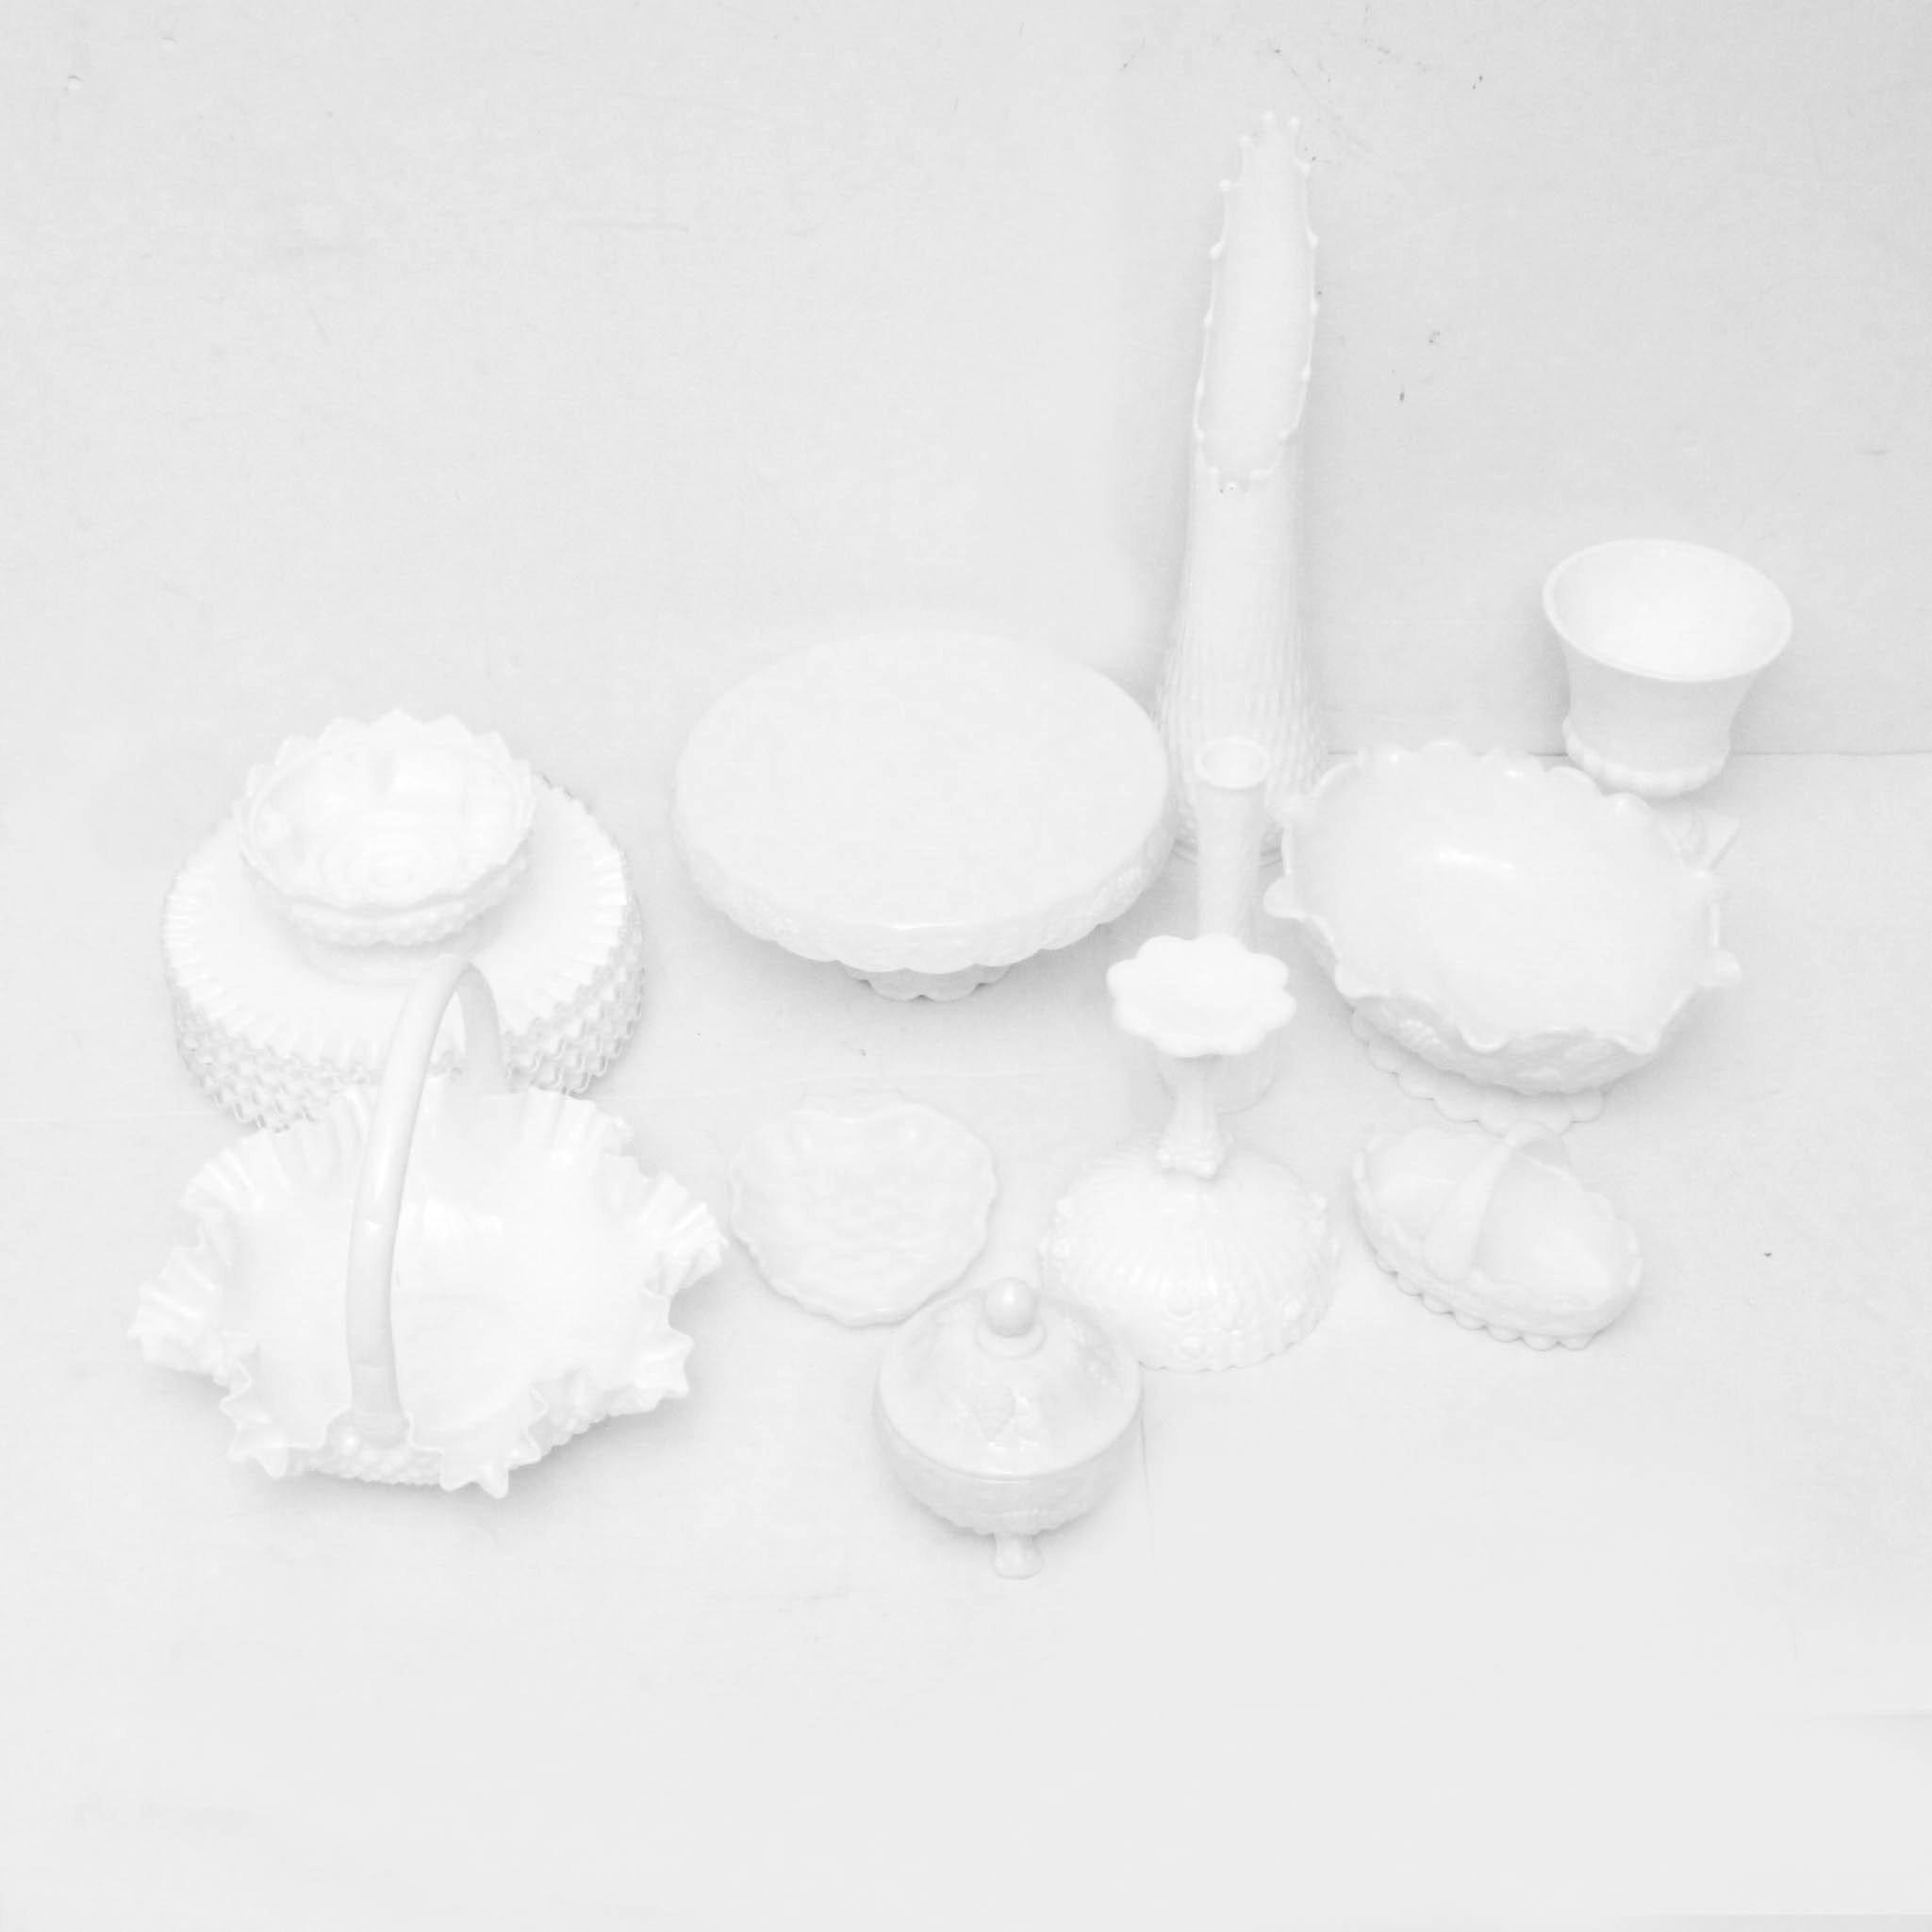 Milk Glass Tableware and Decor